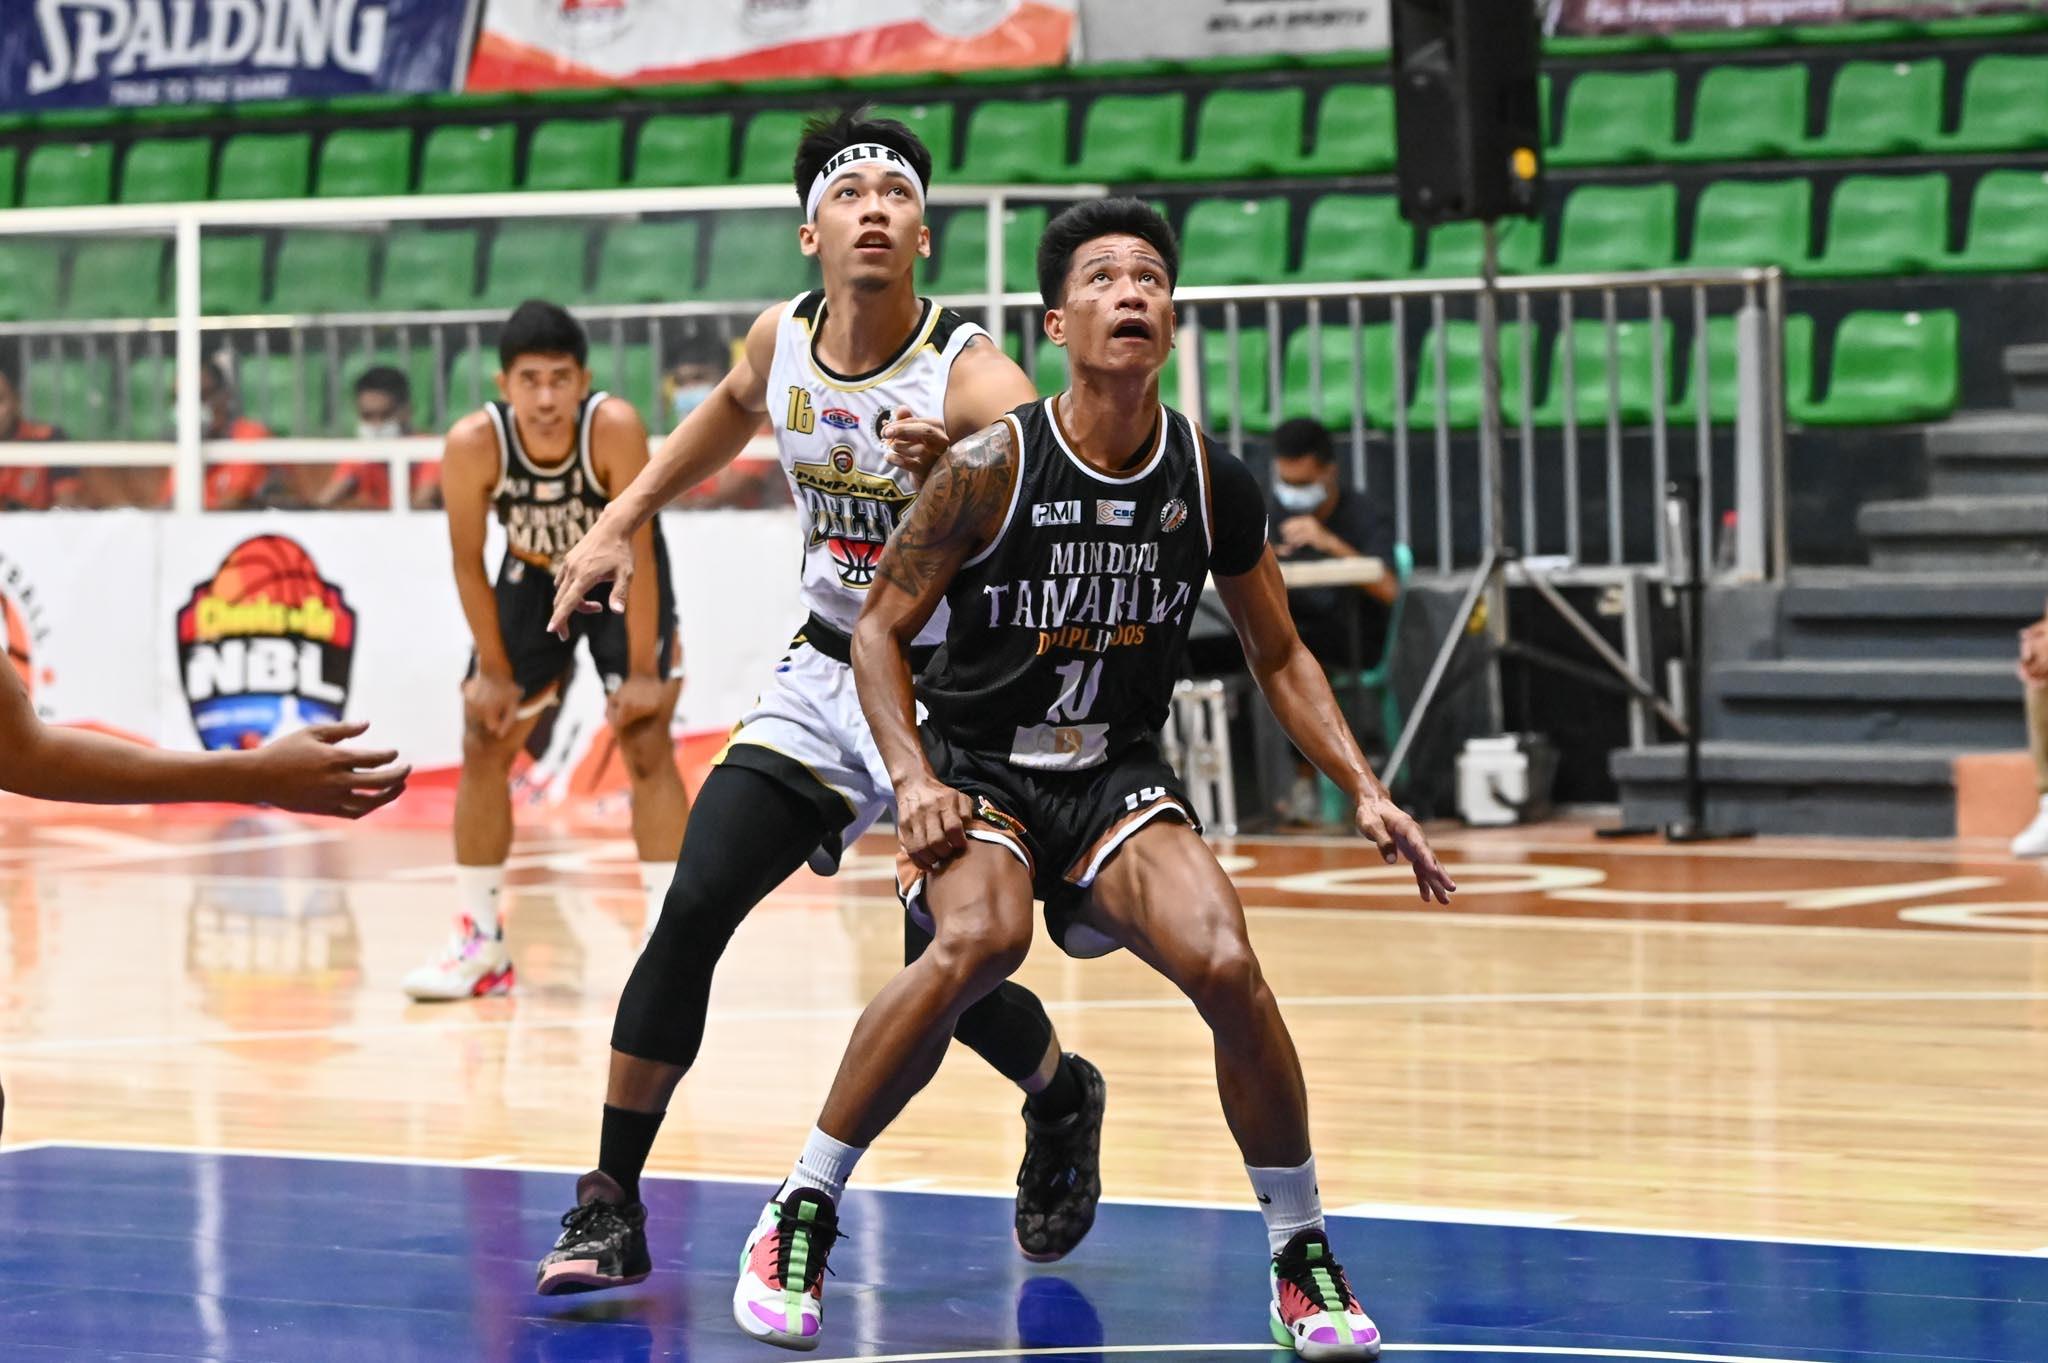 2021-Chooks-NBL-Pampanga-vs-Mindoro-RHANZELLE-YONG-AGAPITO-BERNAL Serrano shines as Pampanga dehorns Mindoro to open NBL back-to-back bid Basketball NBL News  - philippine sports news